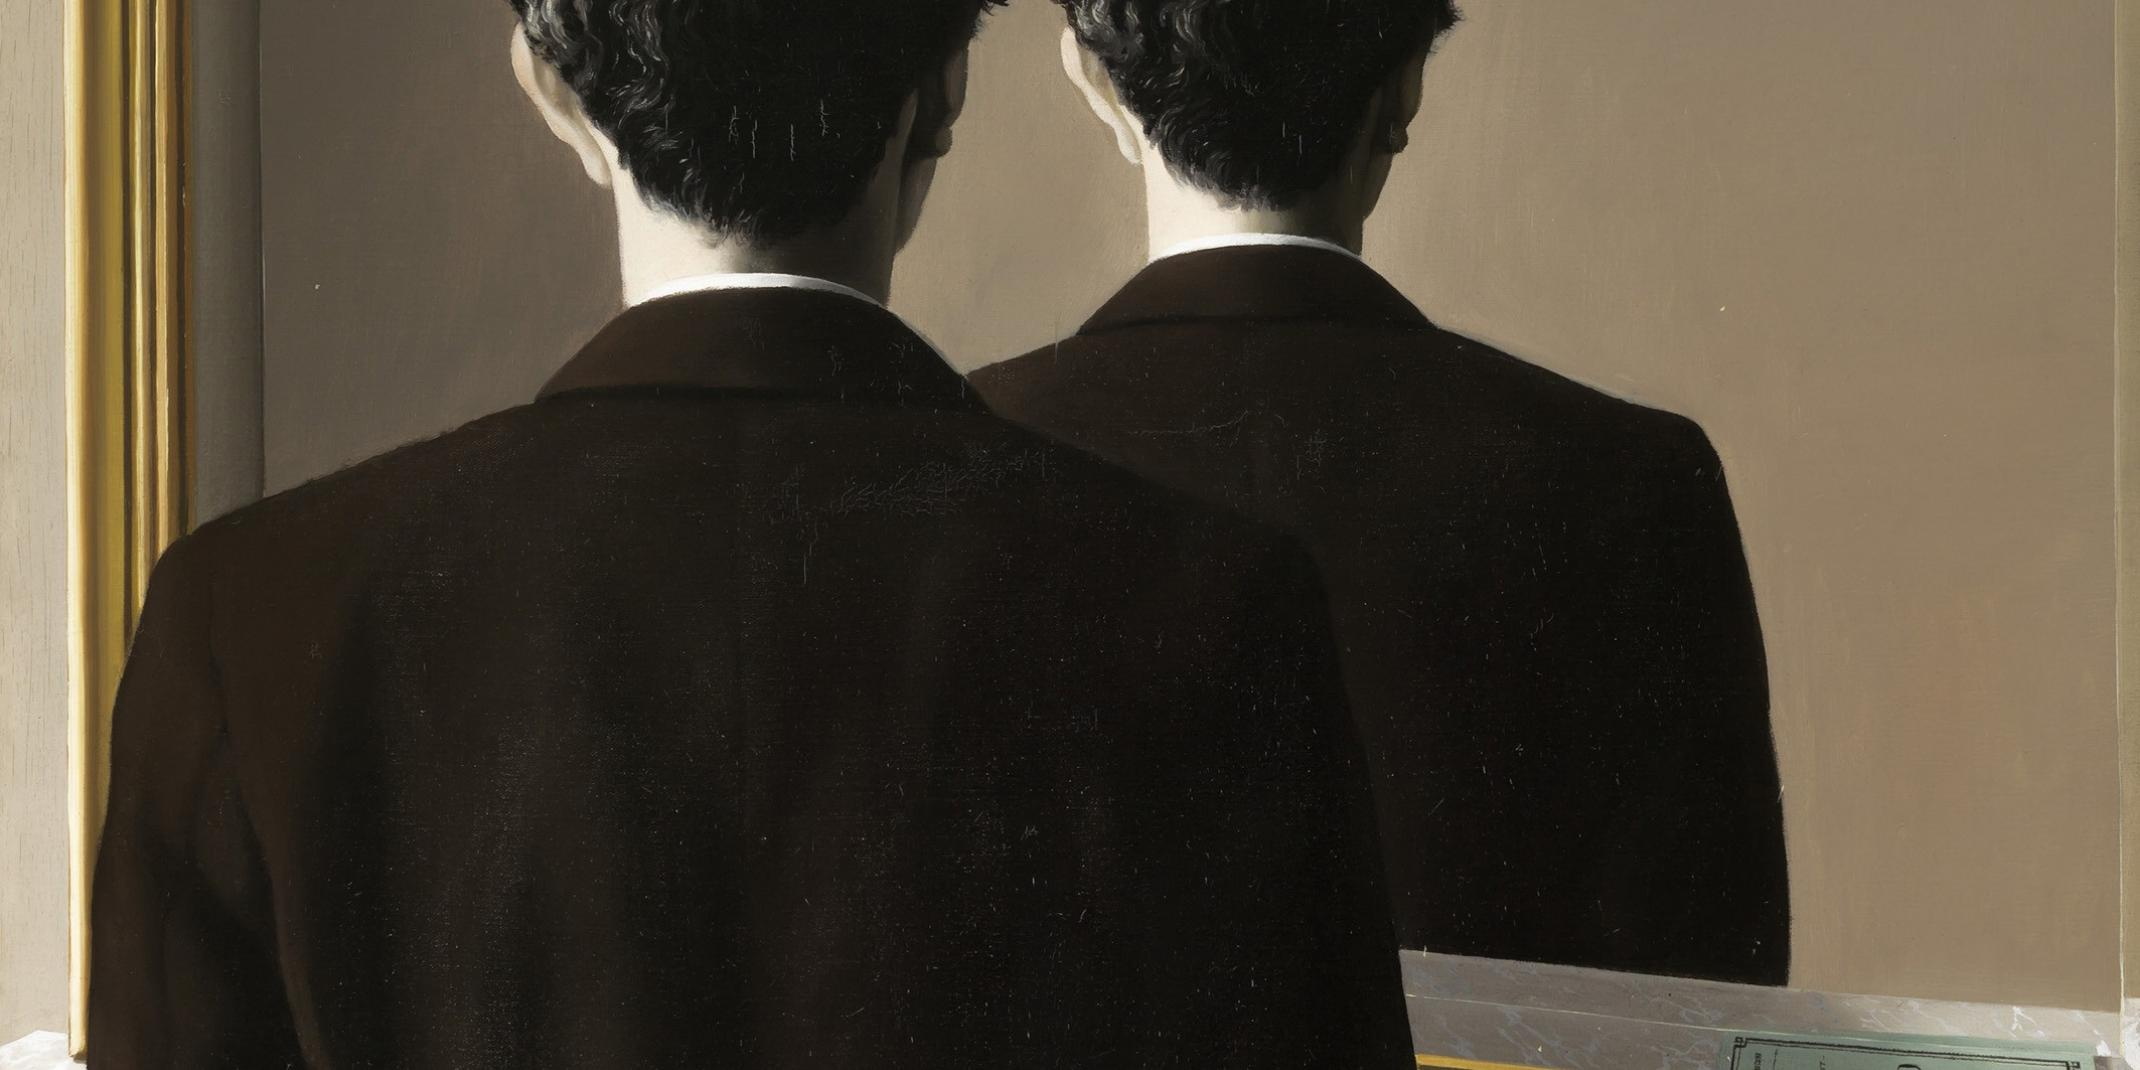 René Magritte (1898–1967), La reproduction interdite (Reproduktion verboten), 1937, Ehemals Sammlung Edward James, Museum Boijmans Van Beuningen, Rotterdam, © VG Bild-Kunst, Bonn 2016